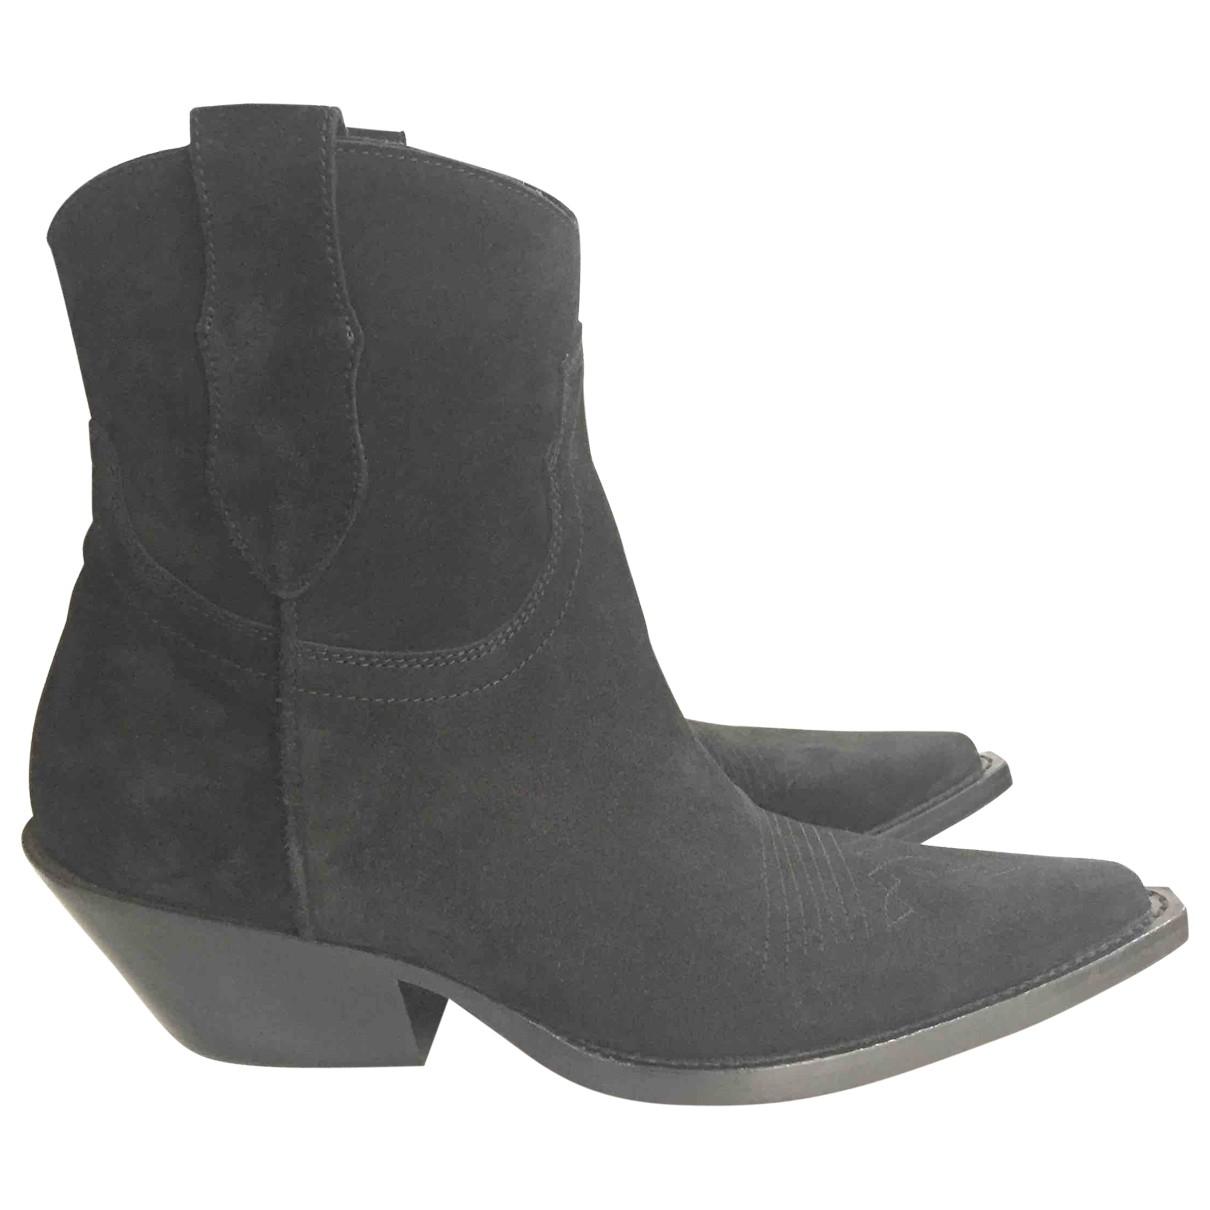 Maison Martin Margiela \N Black Suede Ankle boots for Women 36 EU